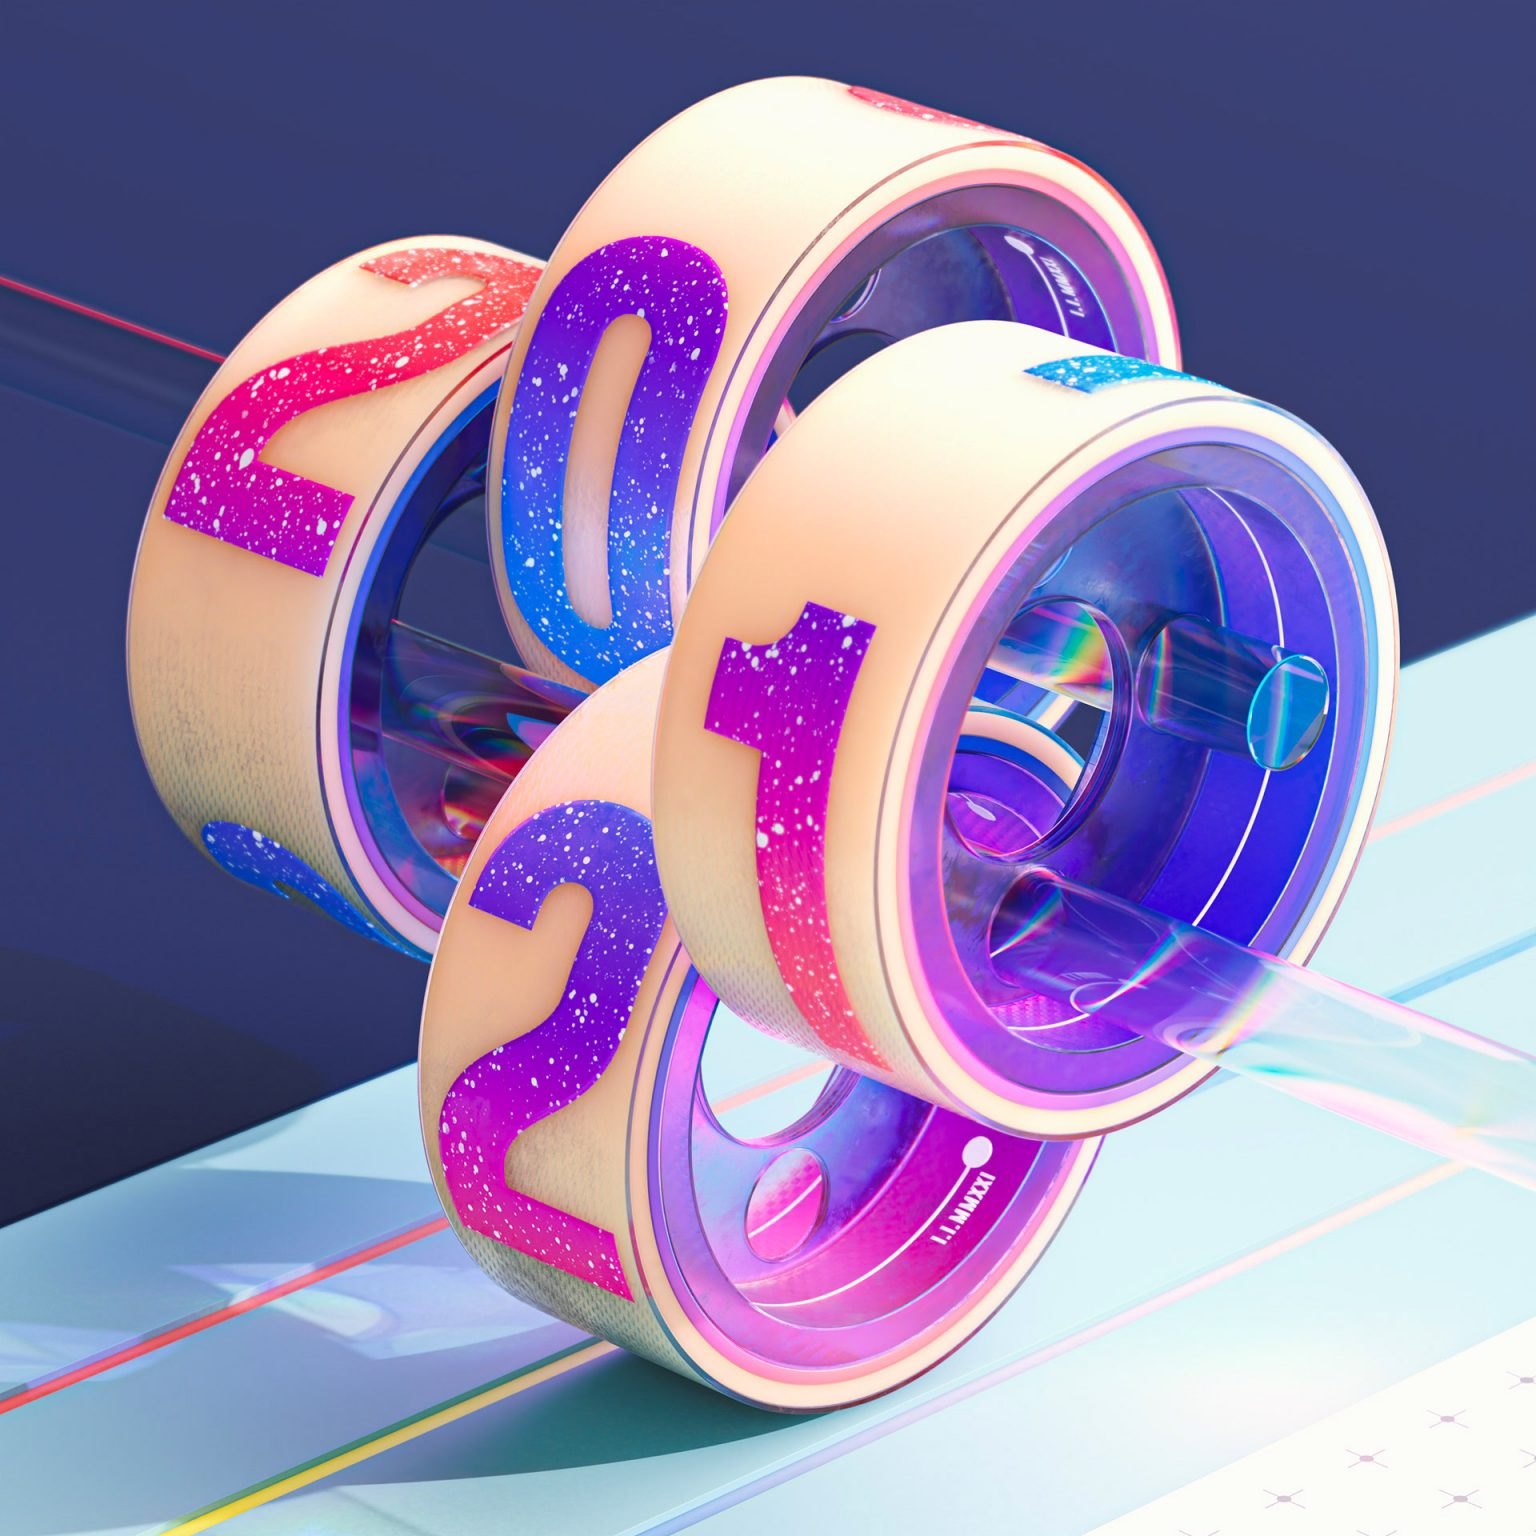 Wes Cockx抽象3D艺术作品